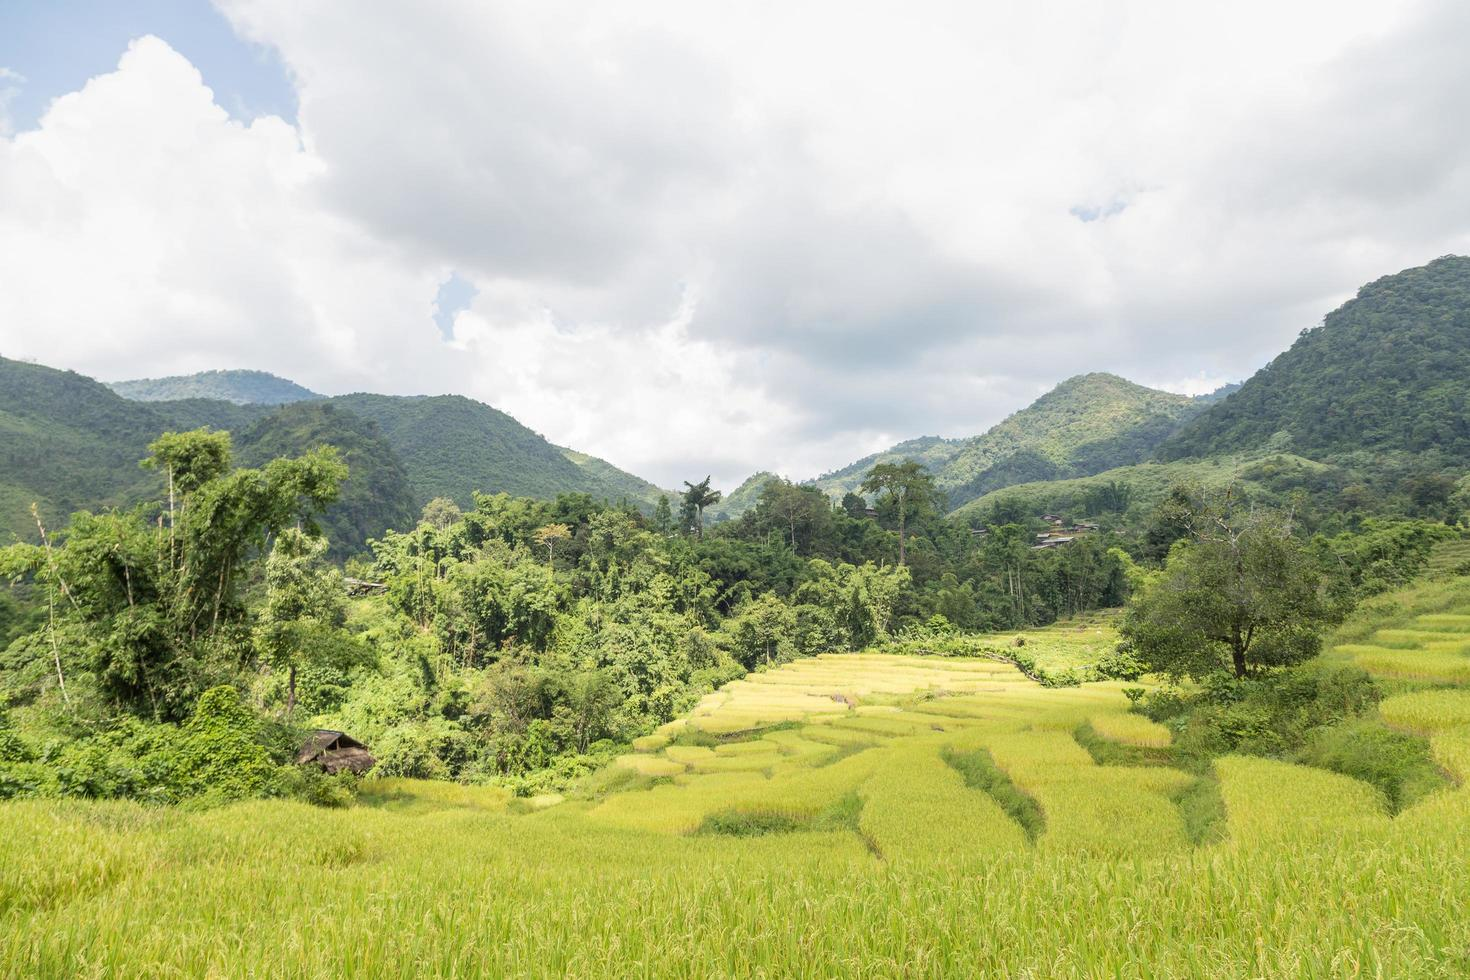 Rice farm on the mountain in Thailand photo